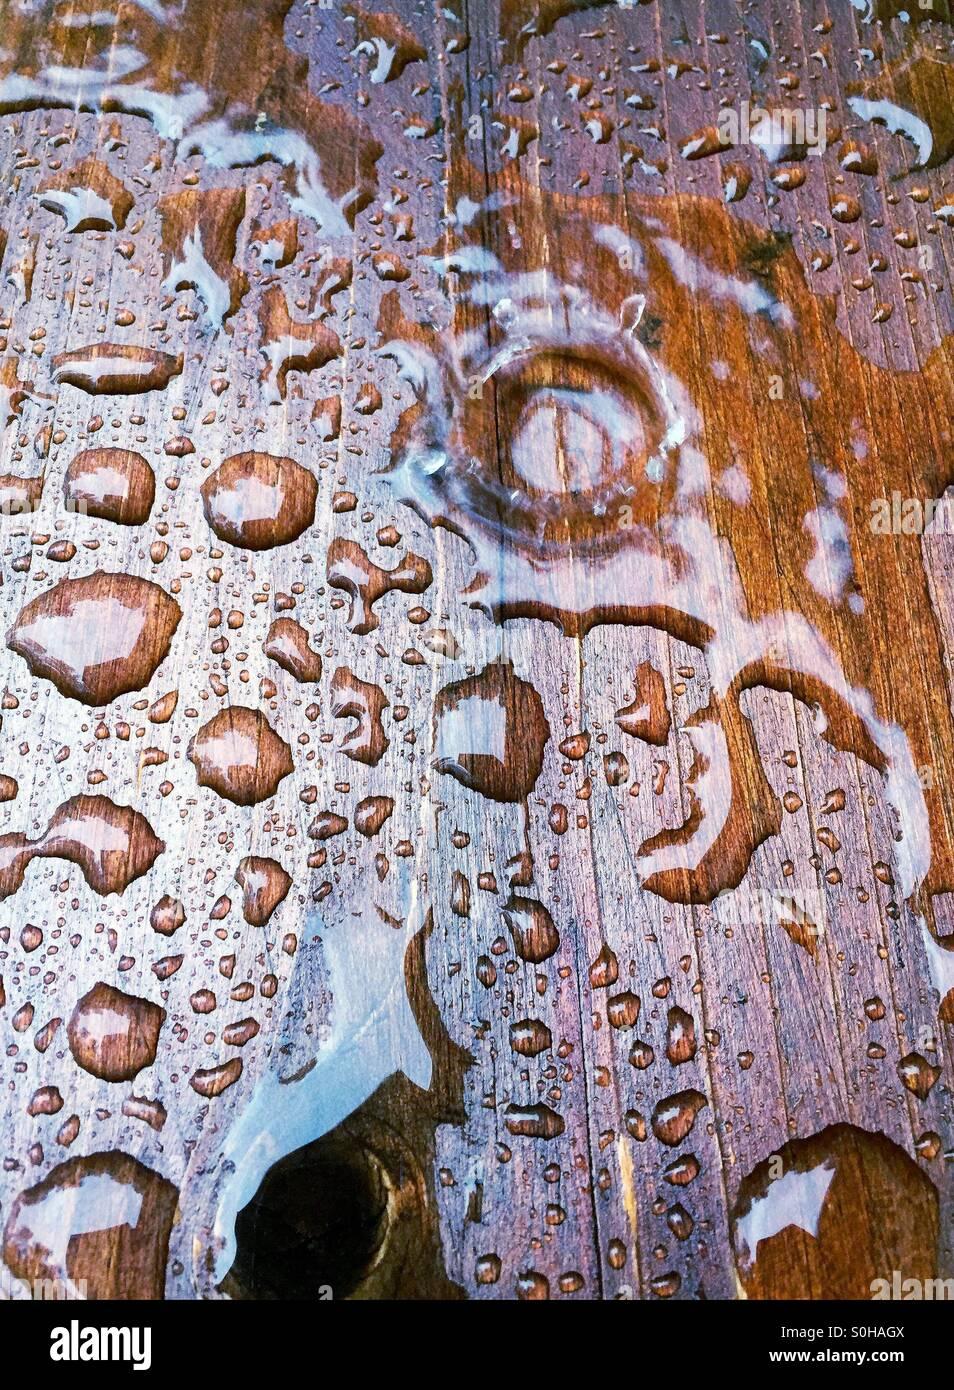 Rain drops on wood - Stock Image